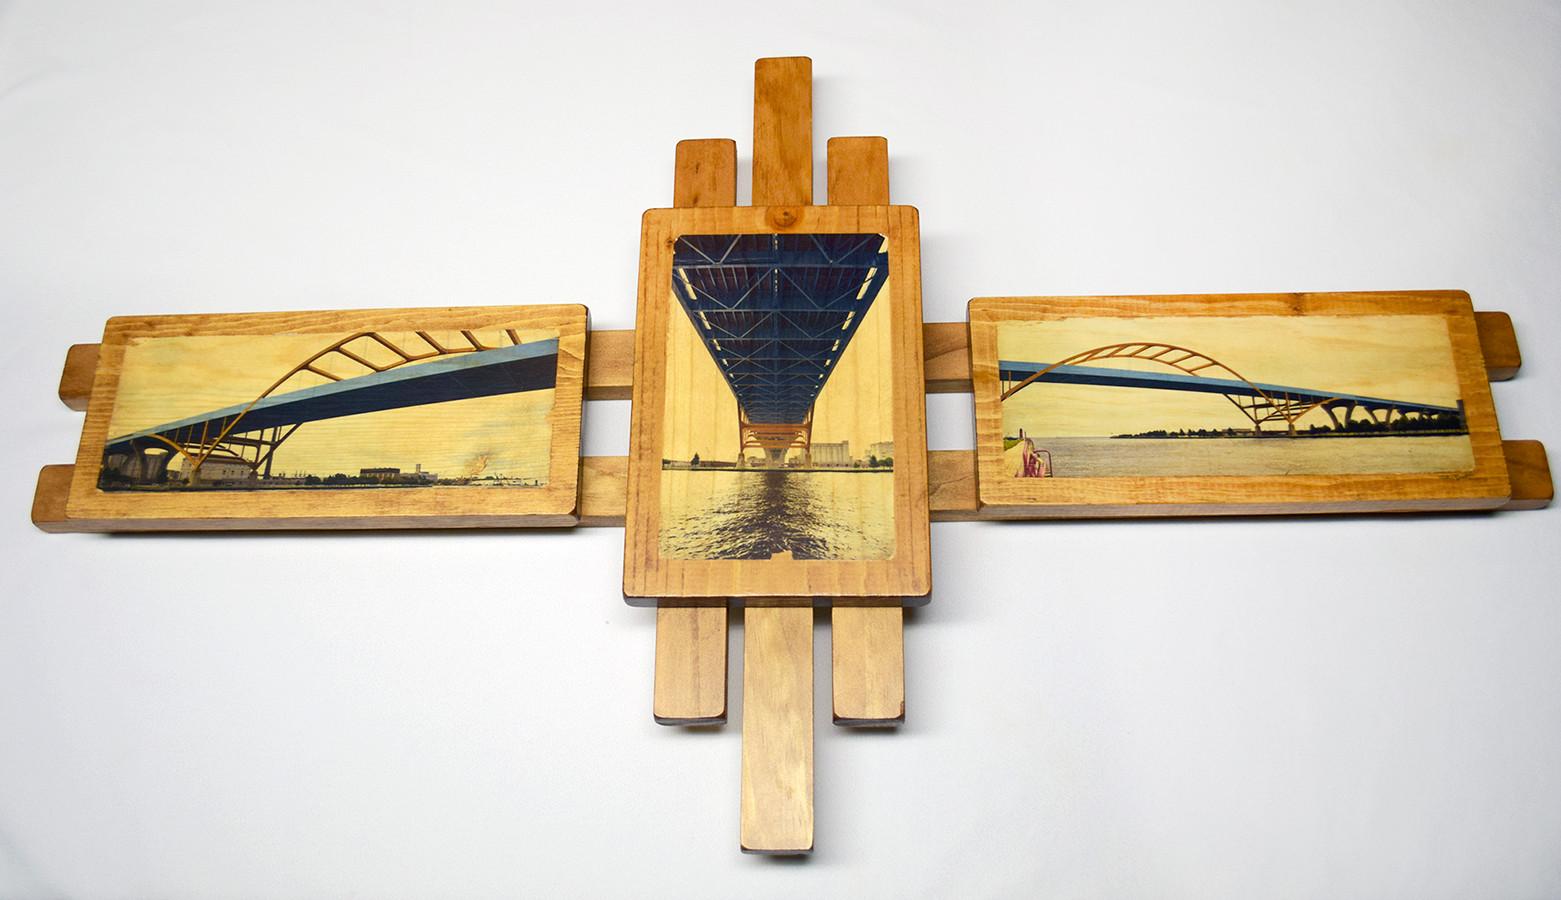 Hoan Bridge - 3 Views